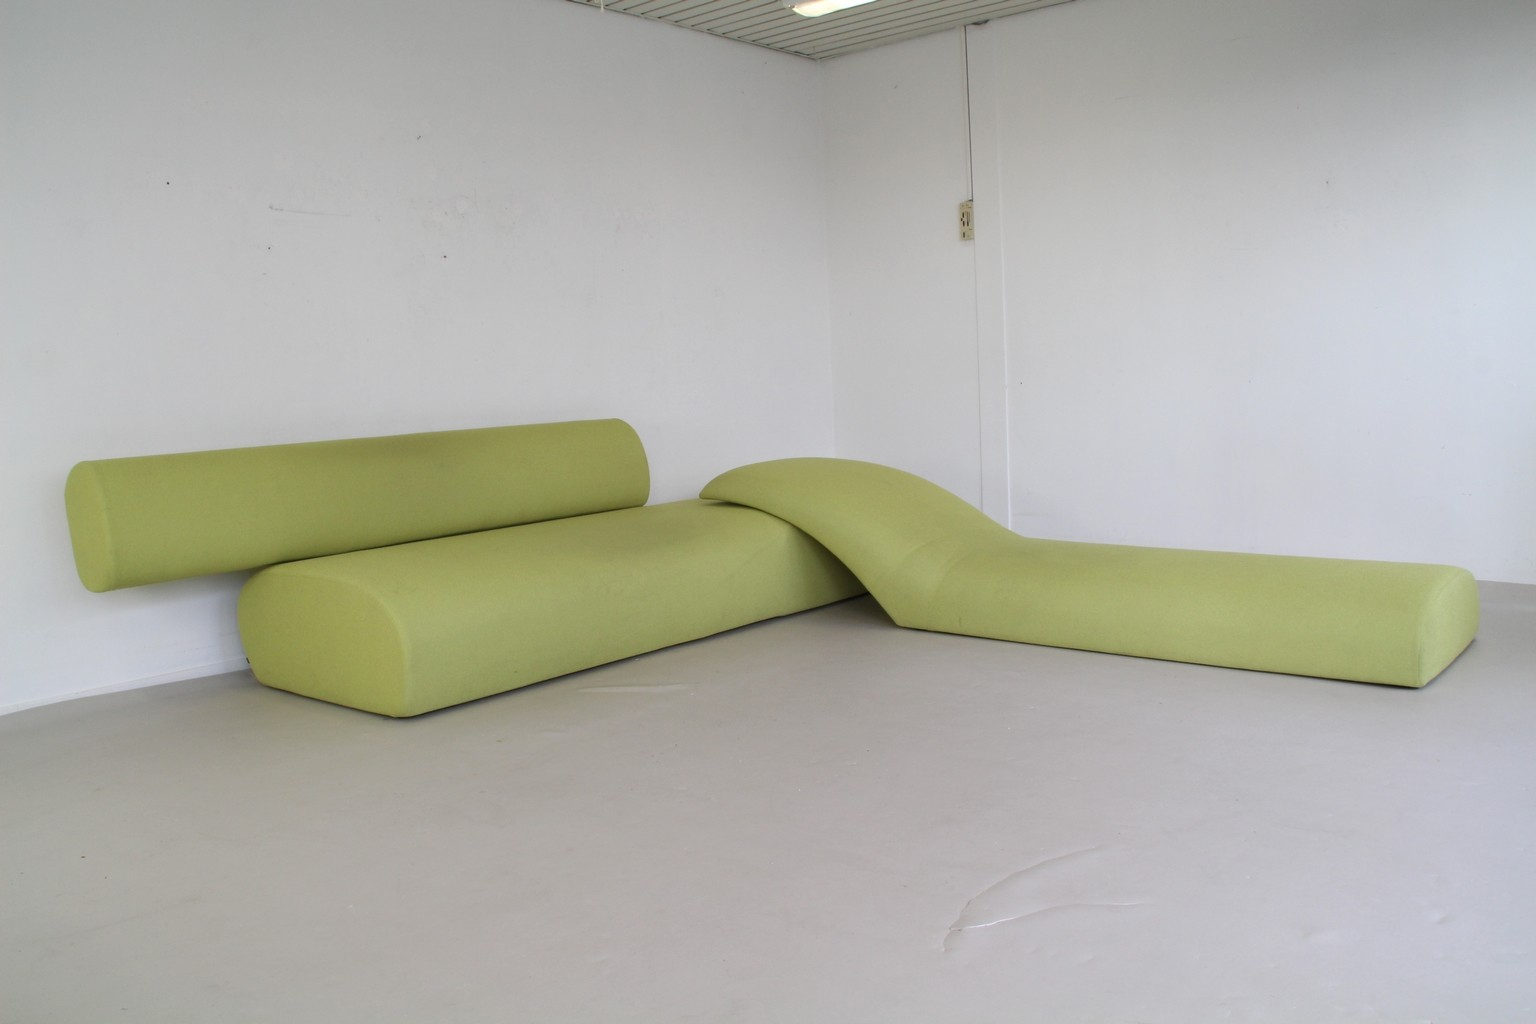 Cor Lava Modular Sofa Kirsten Antje Hoppert Steffen Kroll 2000s